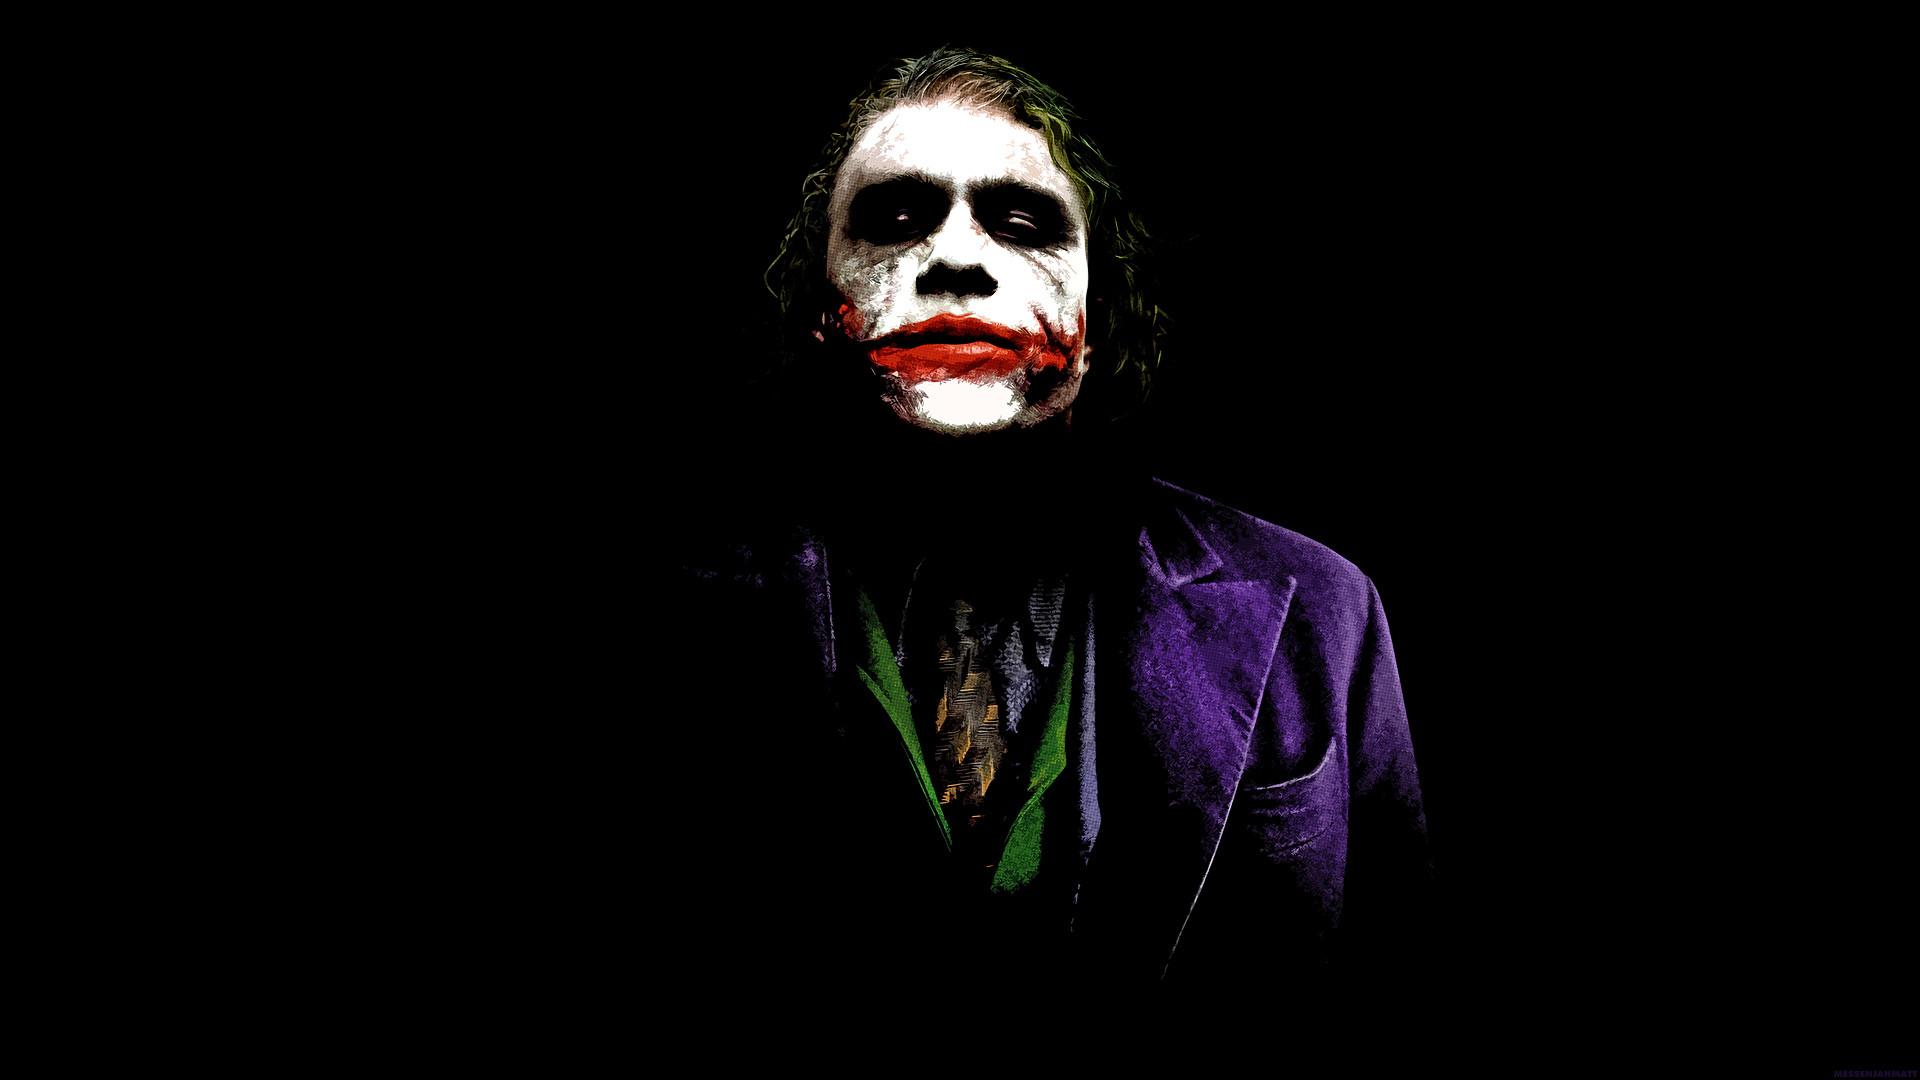 537 <b>Joker HD Wallpapers</b> | <b>Backgrounds